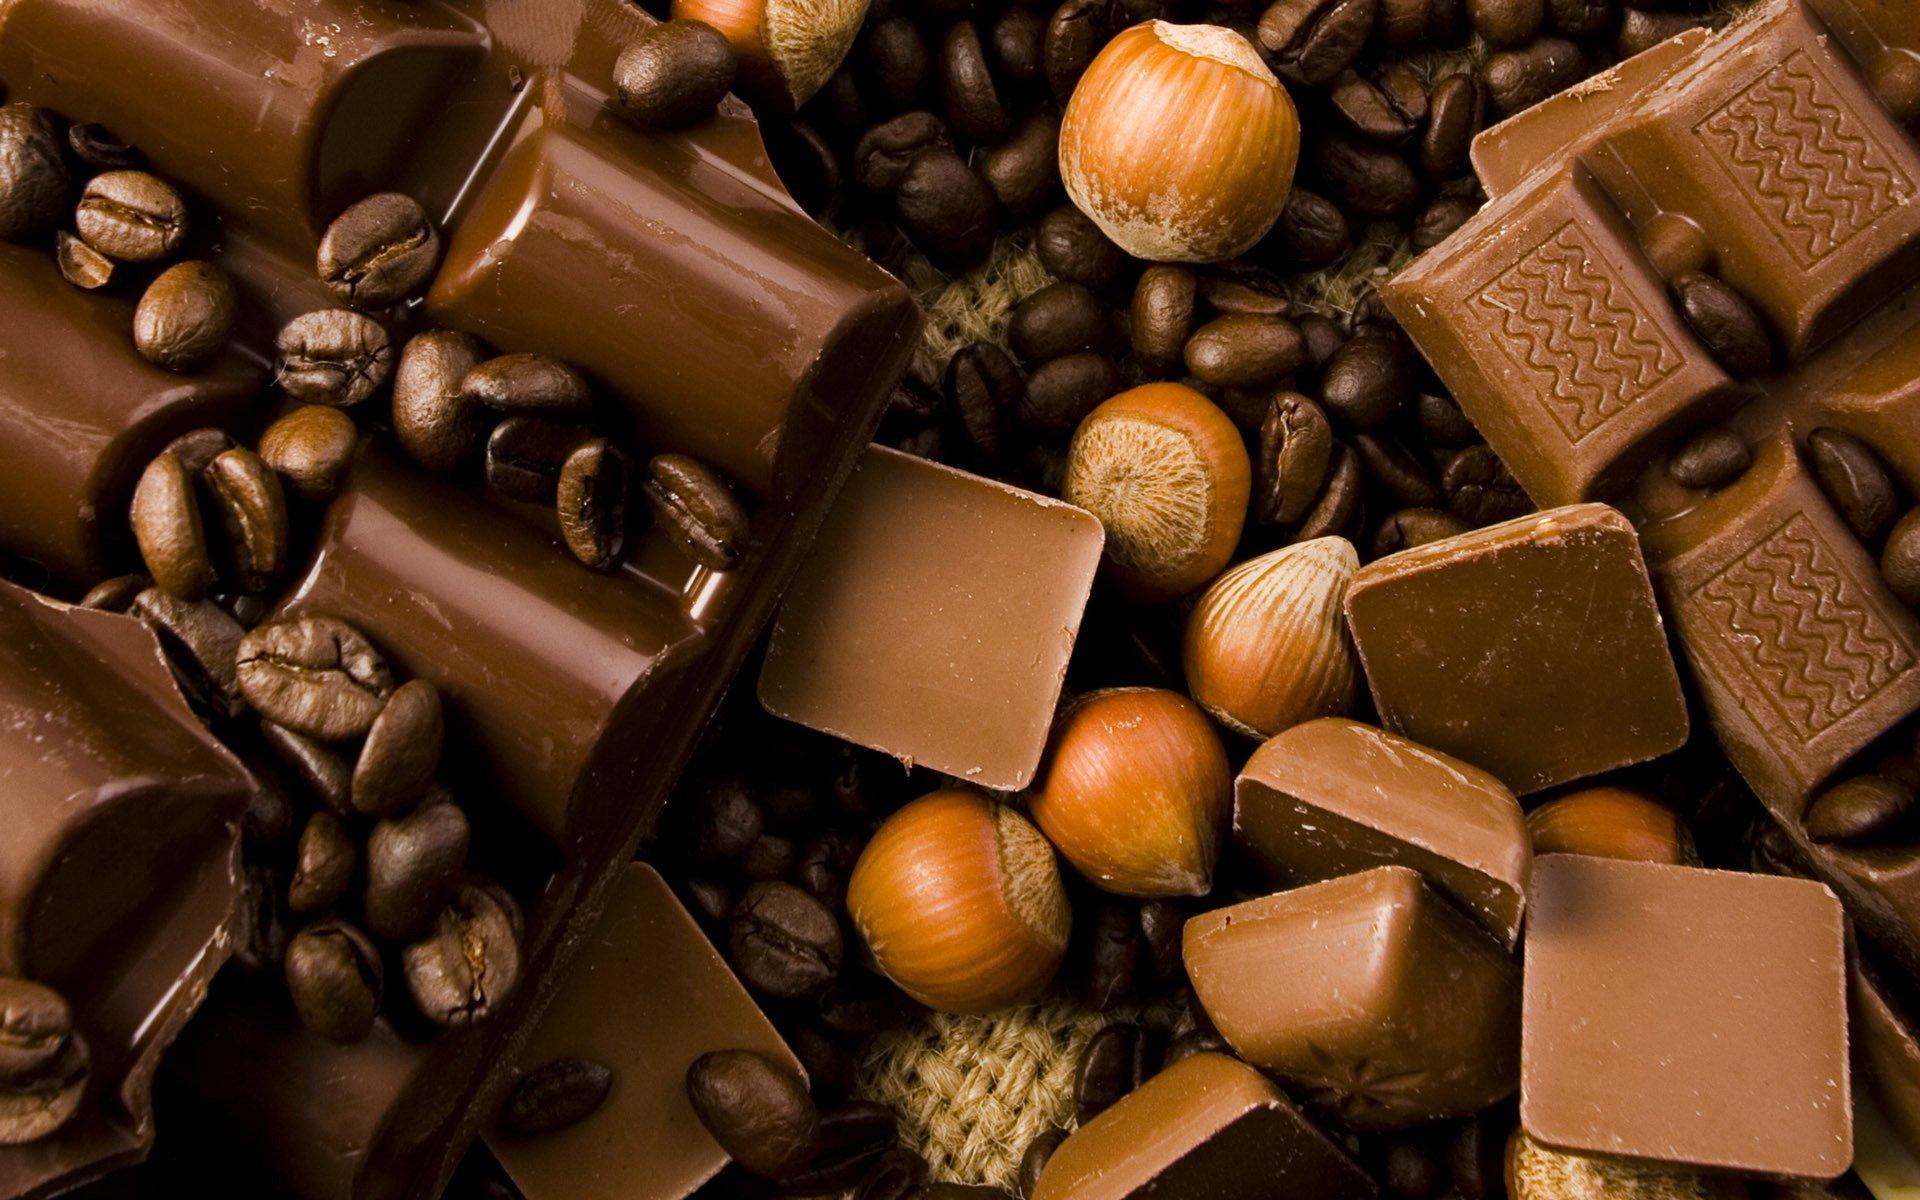 Food - Chocolate  Wallpaper